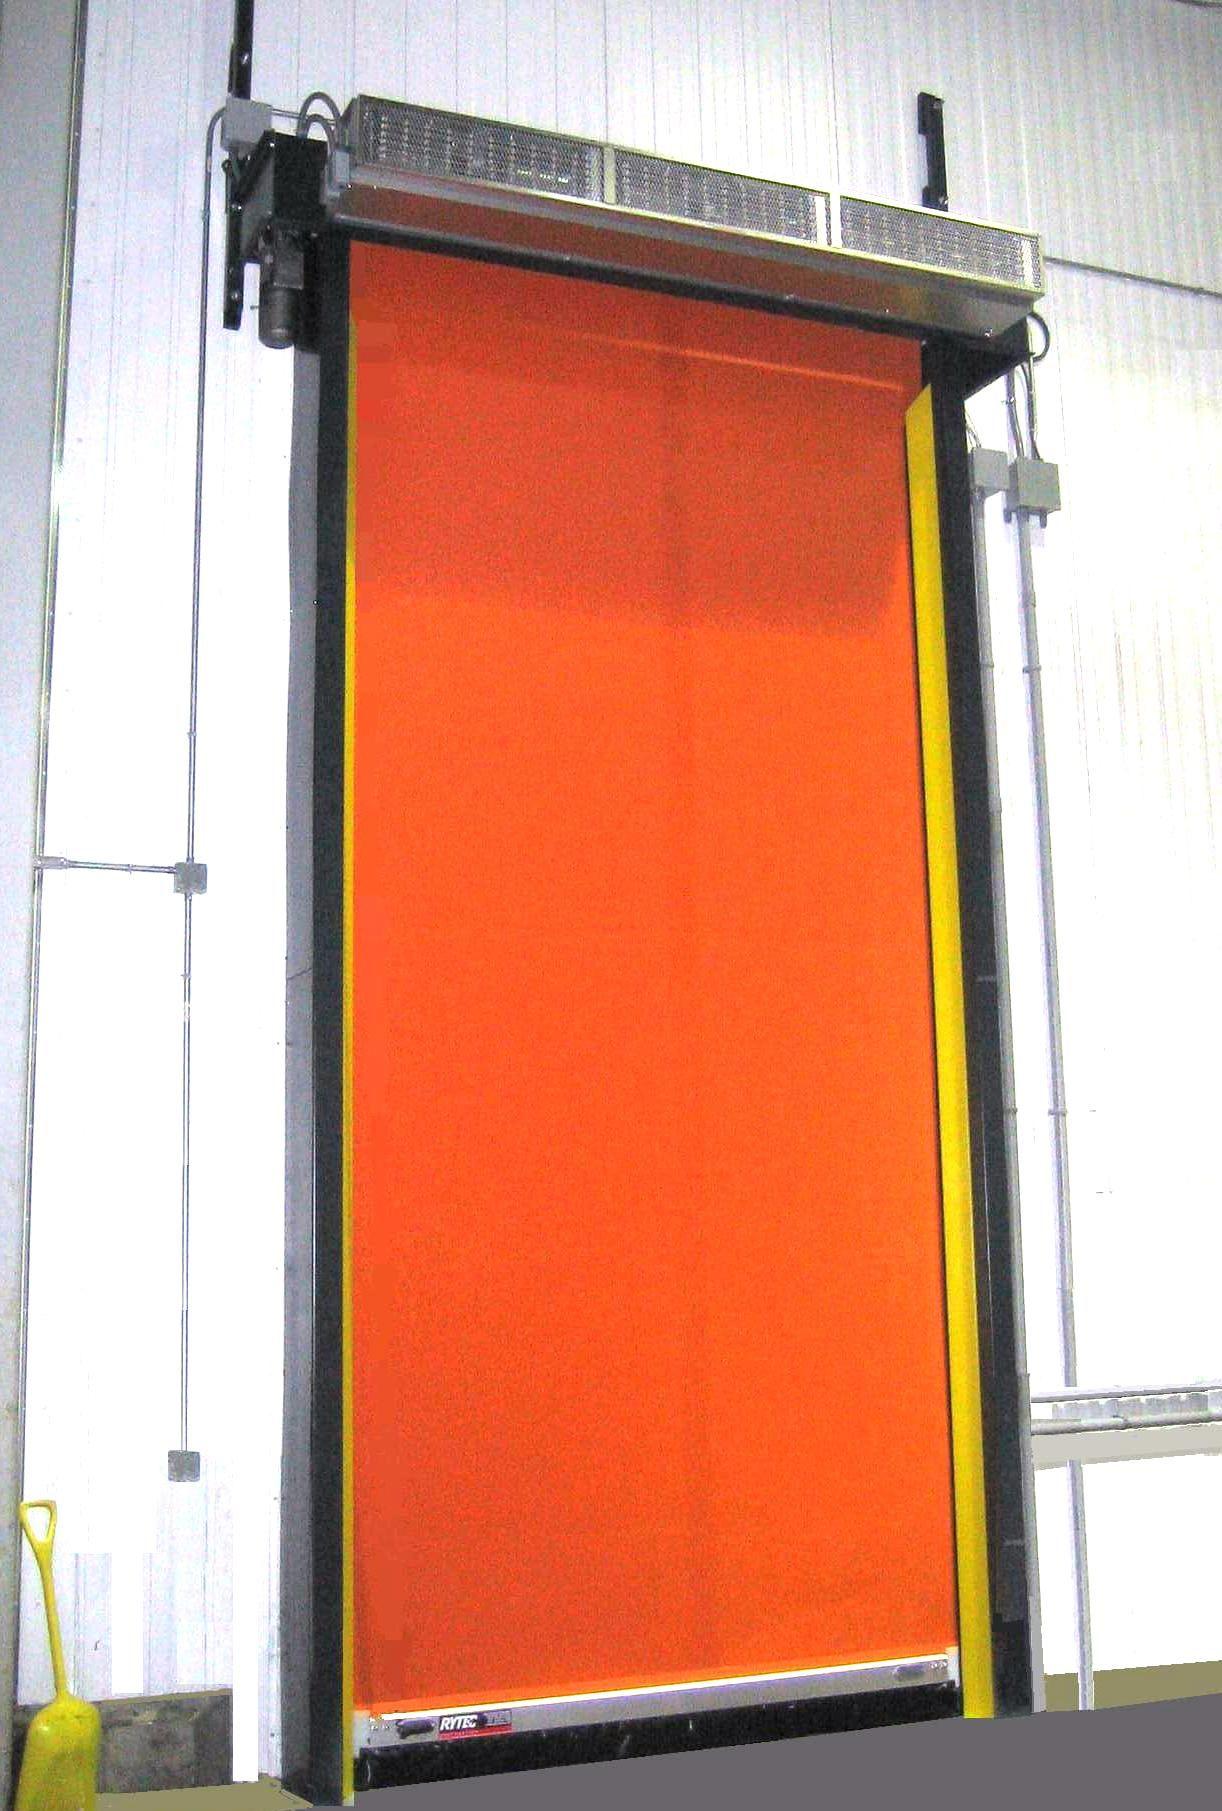 Rytec Doors Turbo-Seal® SR Freezer World\u0027s fastest self-repairing freezer door & Rytec Doors Turbo-Seal® SR Freezer World\u0027s fastest self-repairing ...